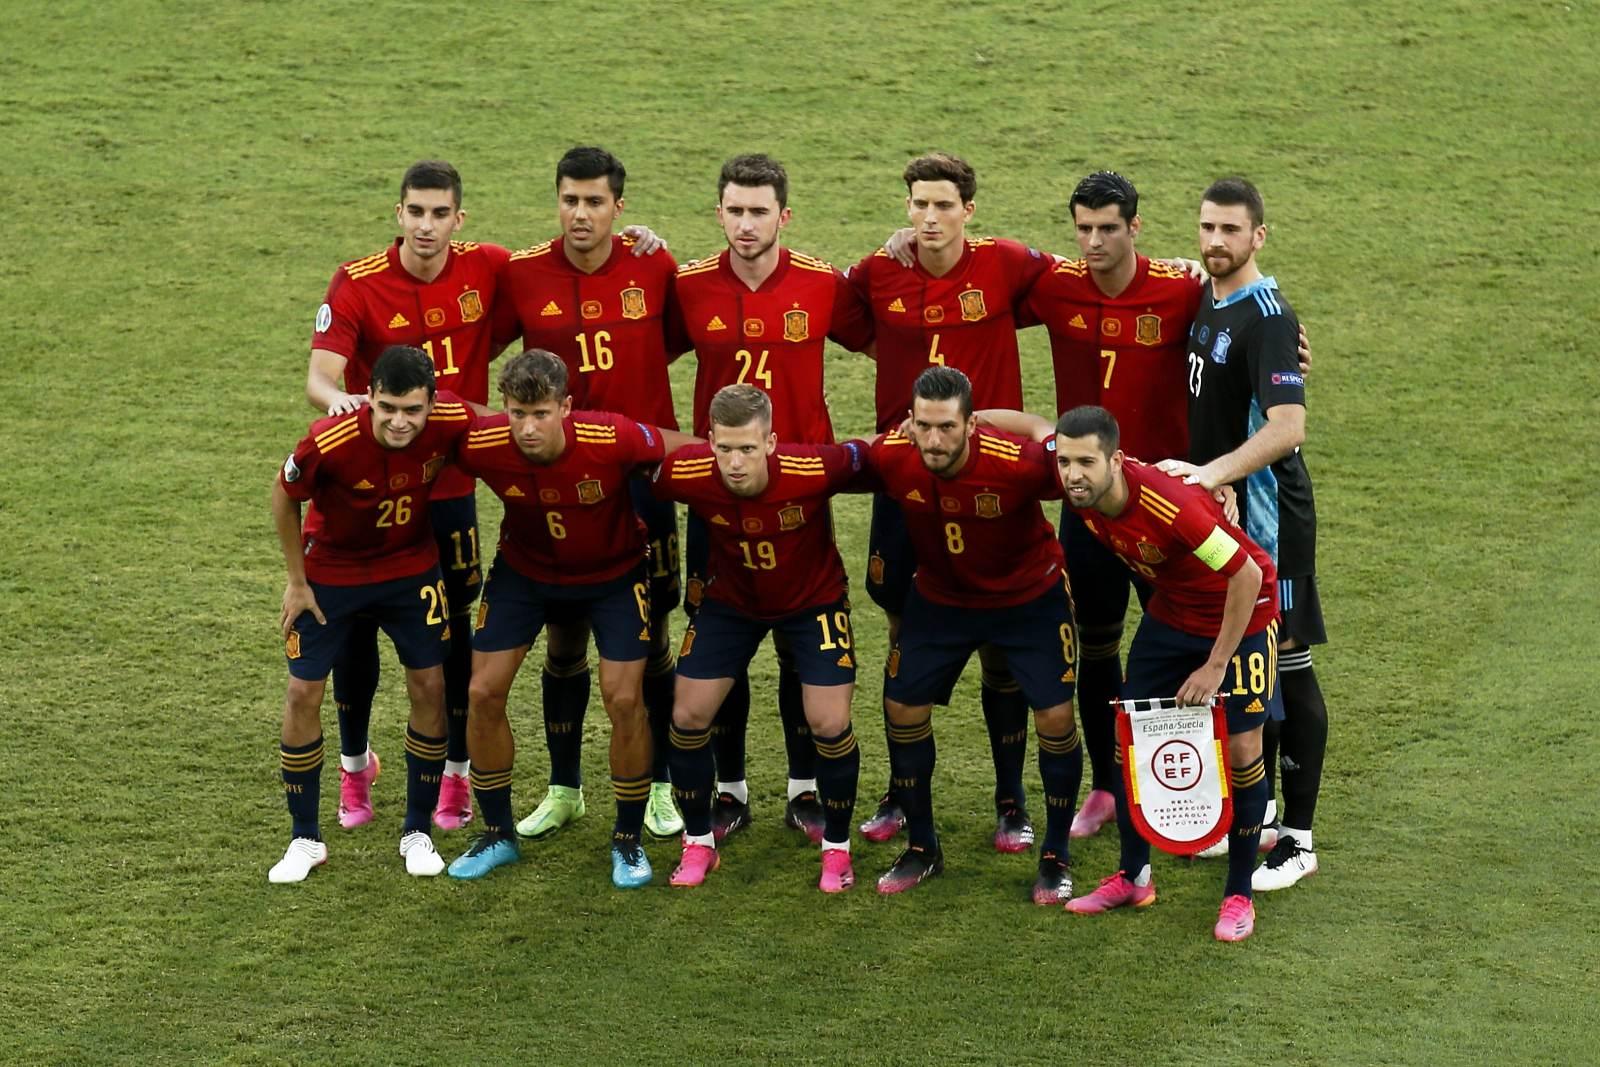 Швеция – Испания - 2:1 (завершён)